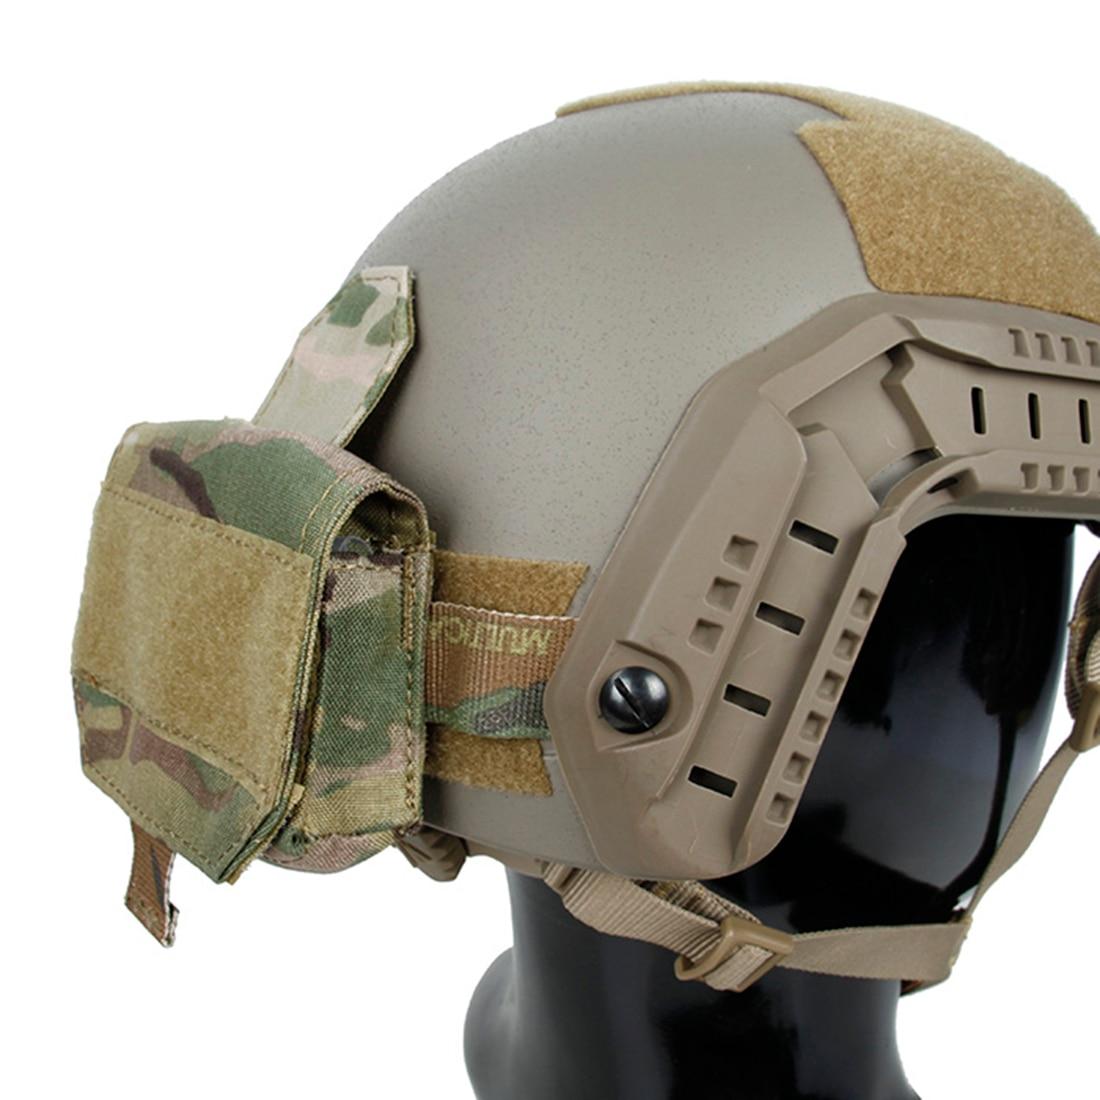 TMC Helmet Battery Pouch Multicam Battery Case Storage Bag - Type A Camouflage